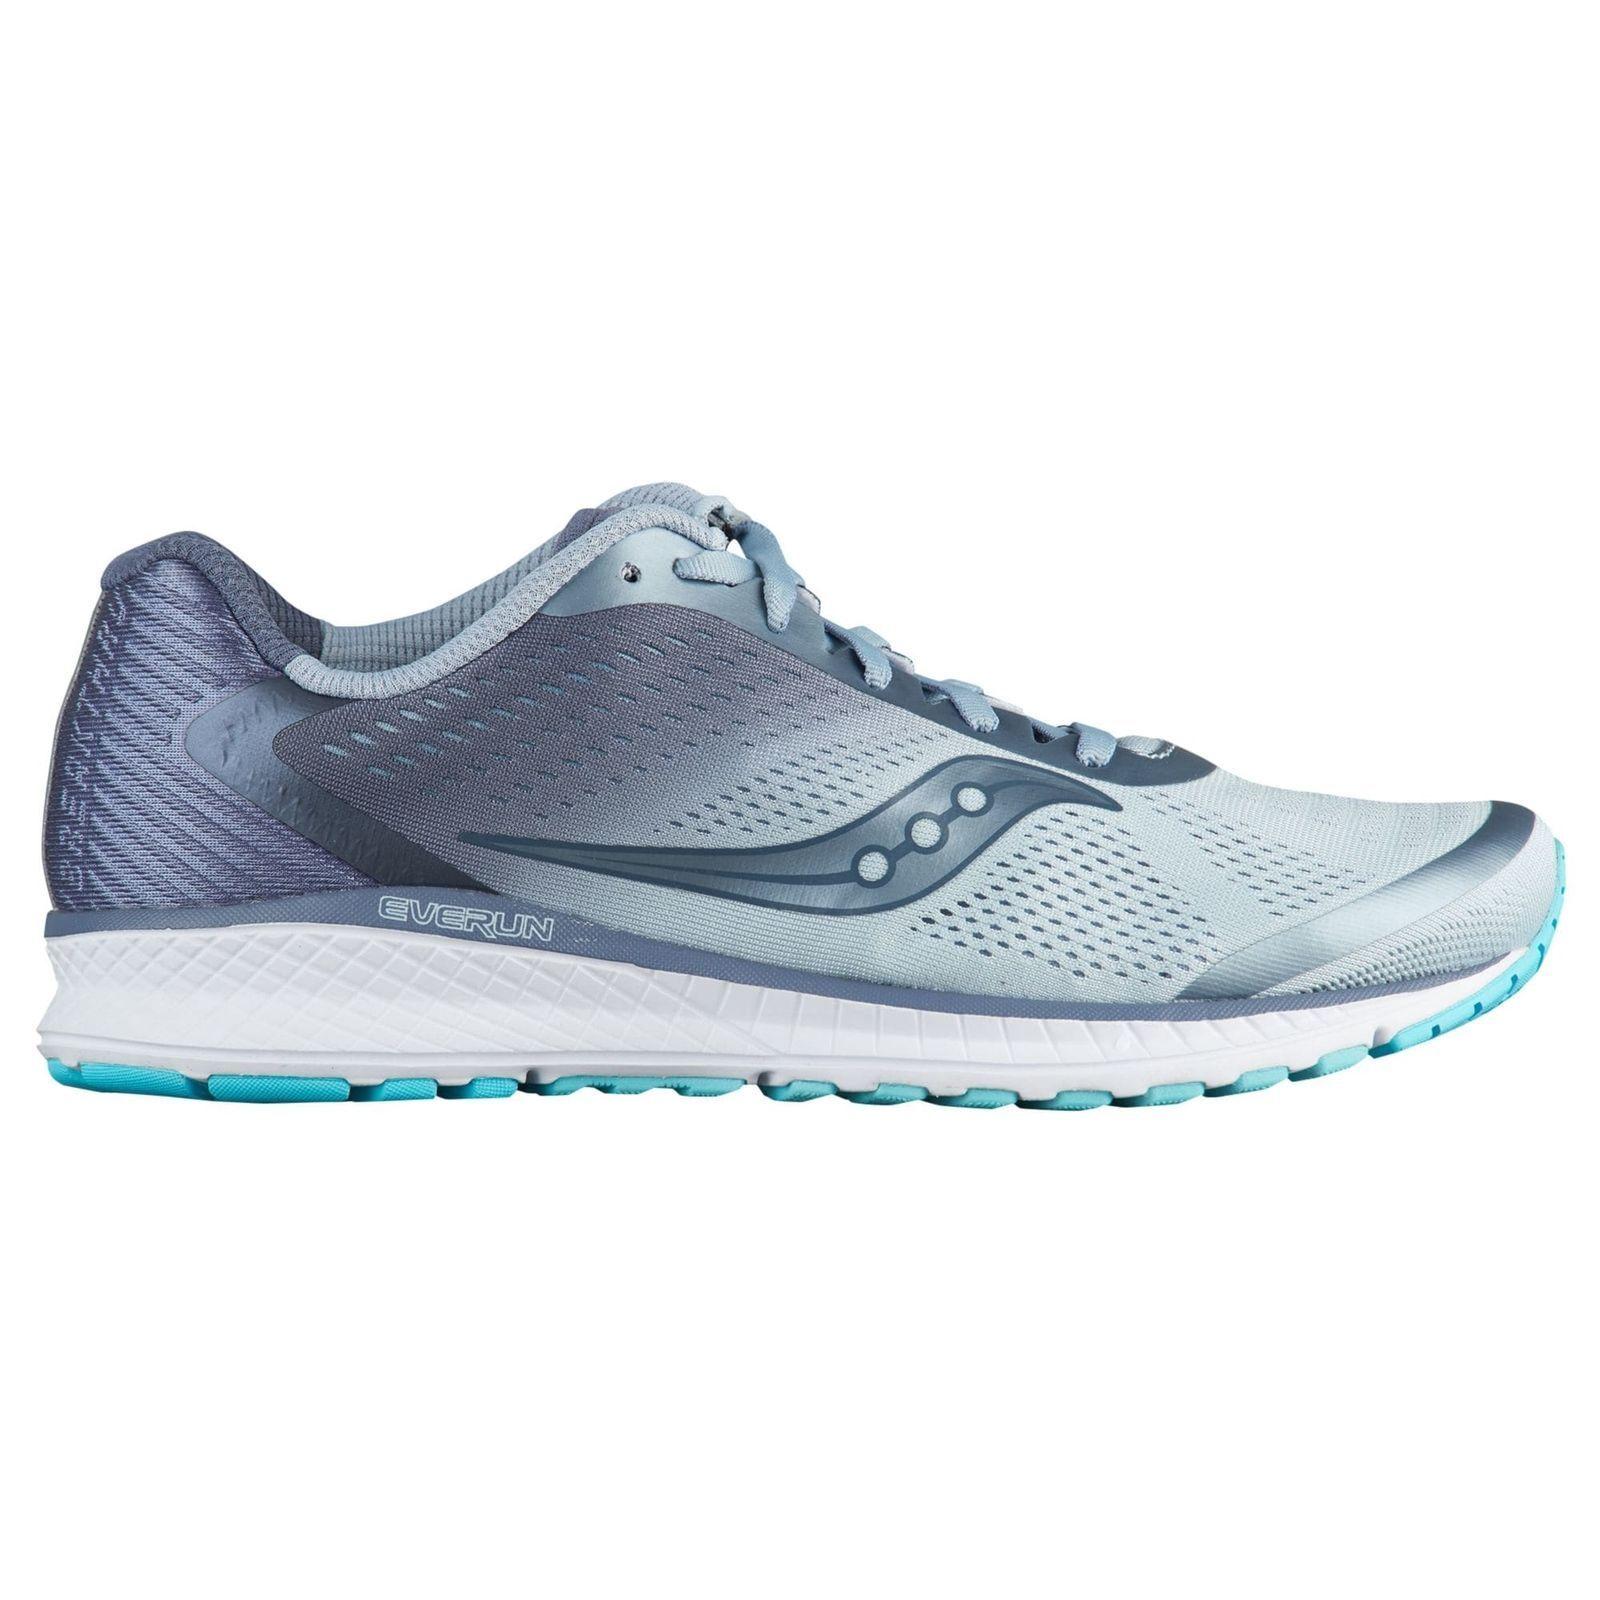 SAUCONY BREAKTHRU 4 Mujer Running zapatos (Talla 8) Niebla gris Azul 104191